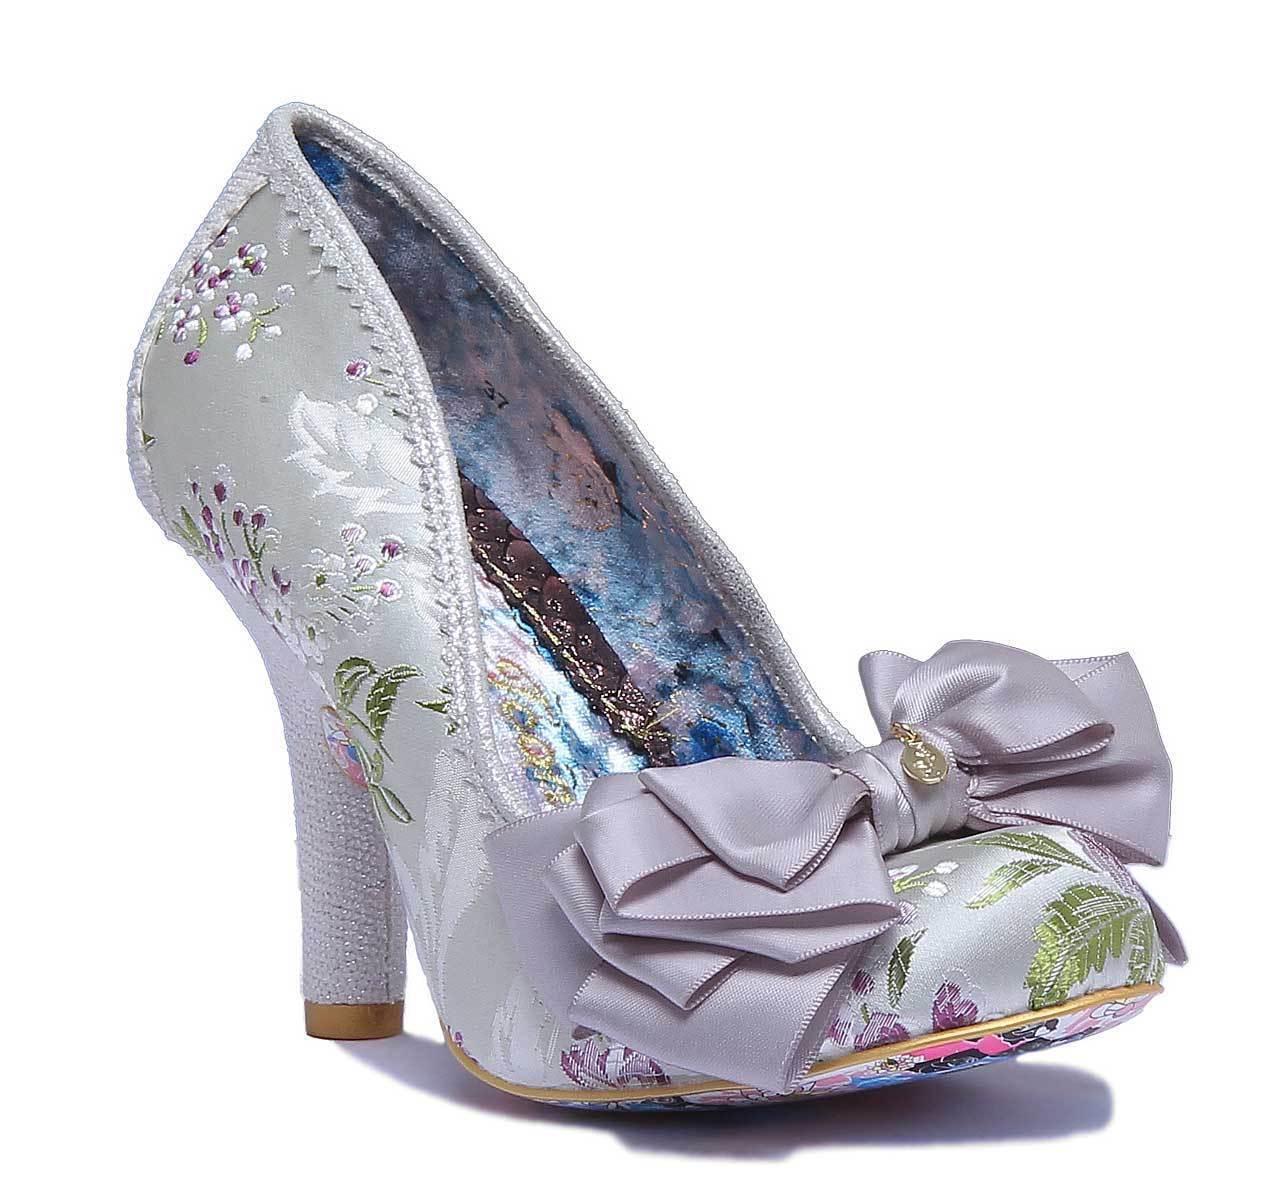 Irregular Choice Ascot Damens Other Fabric Silver Closed Toe Pumps Größe UK 3 - 8